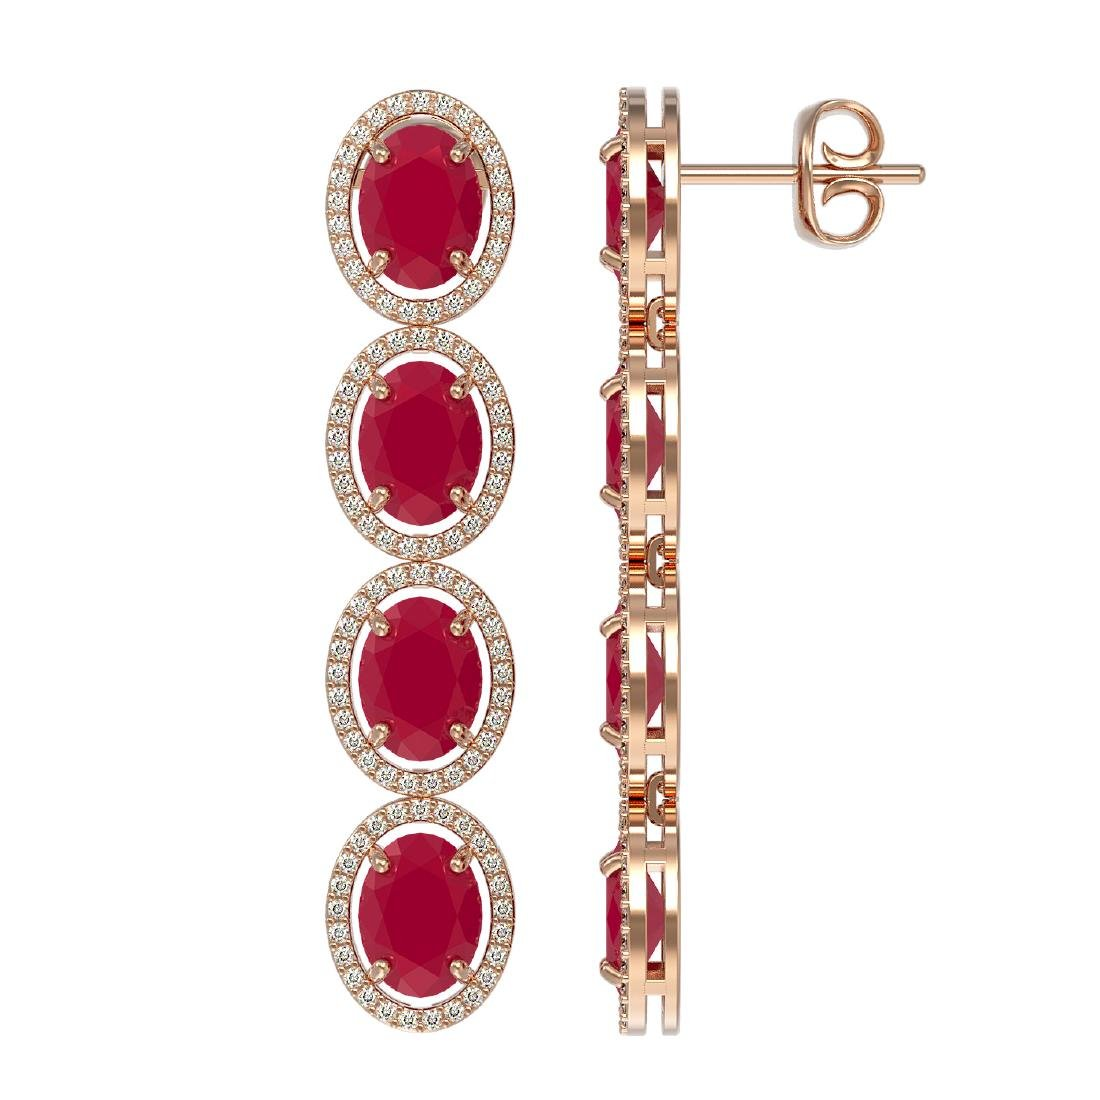 15.68 CTW Ruby & Diamond Halo Earrings 10K Rose Gold